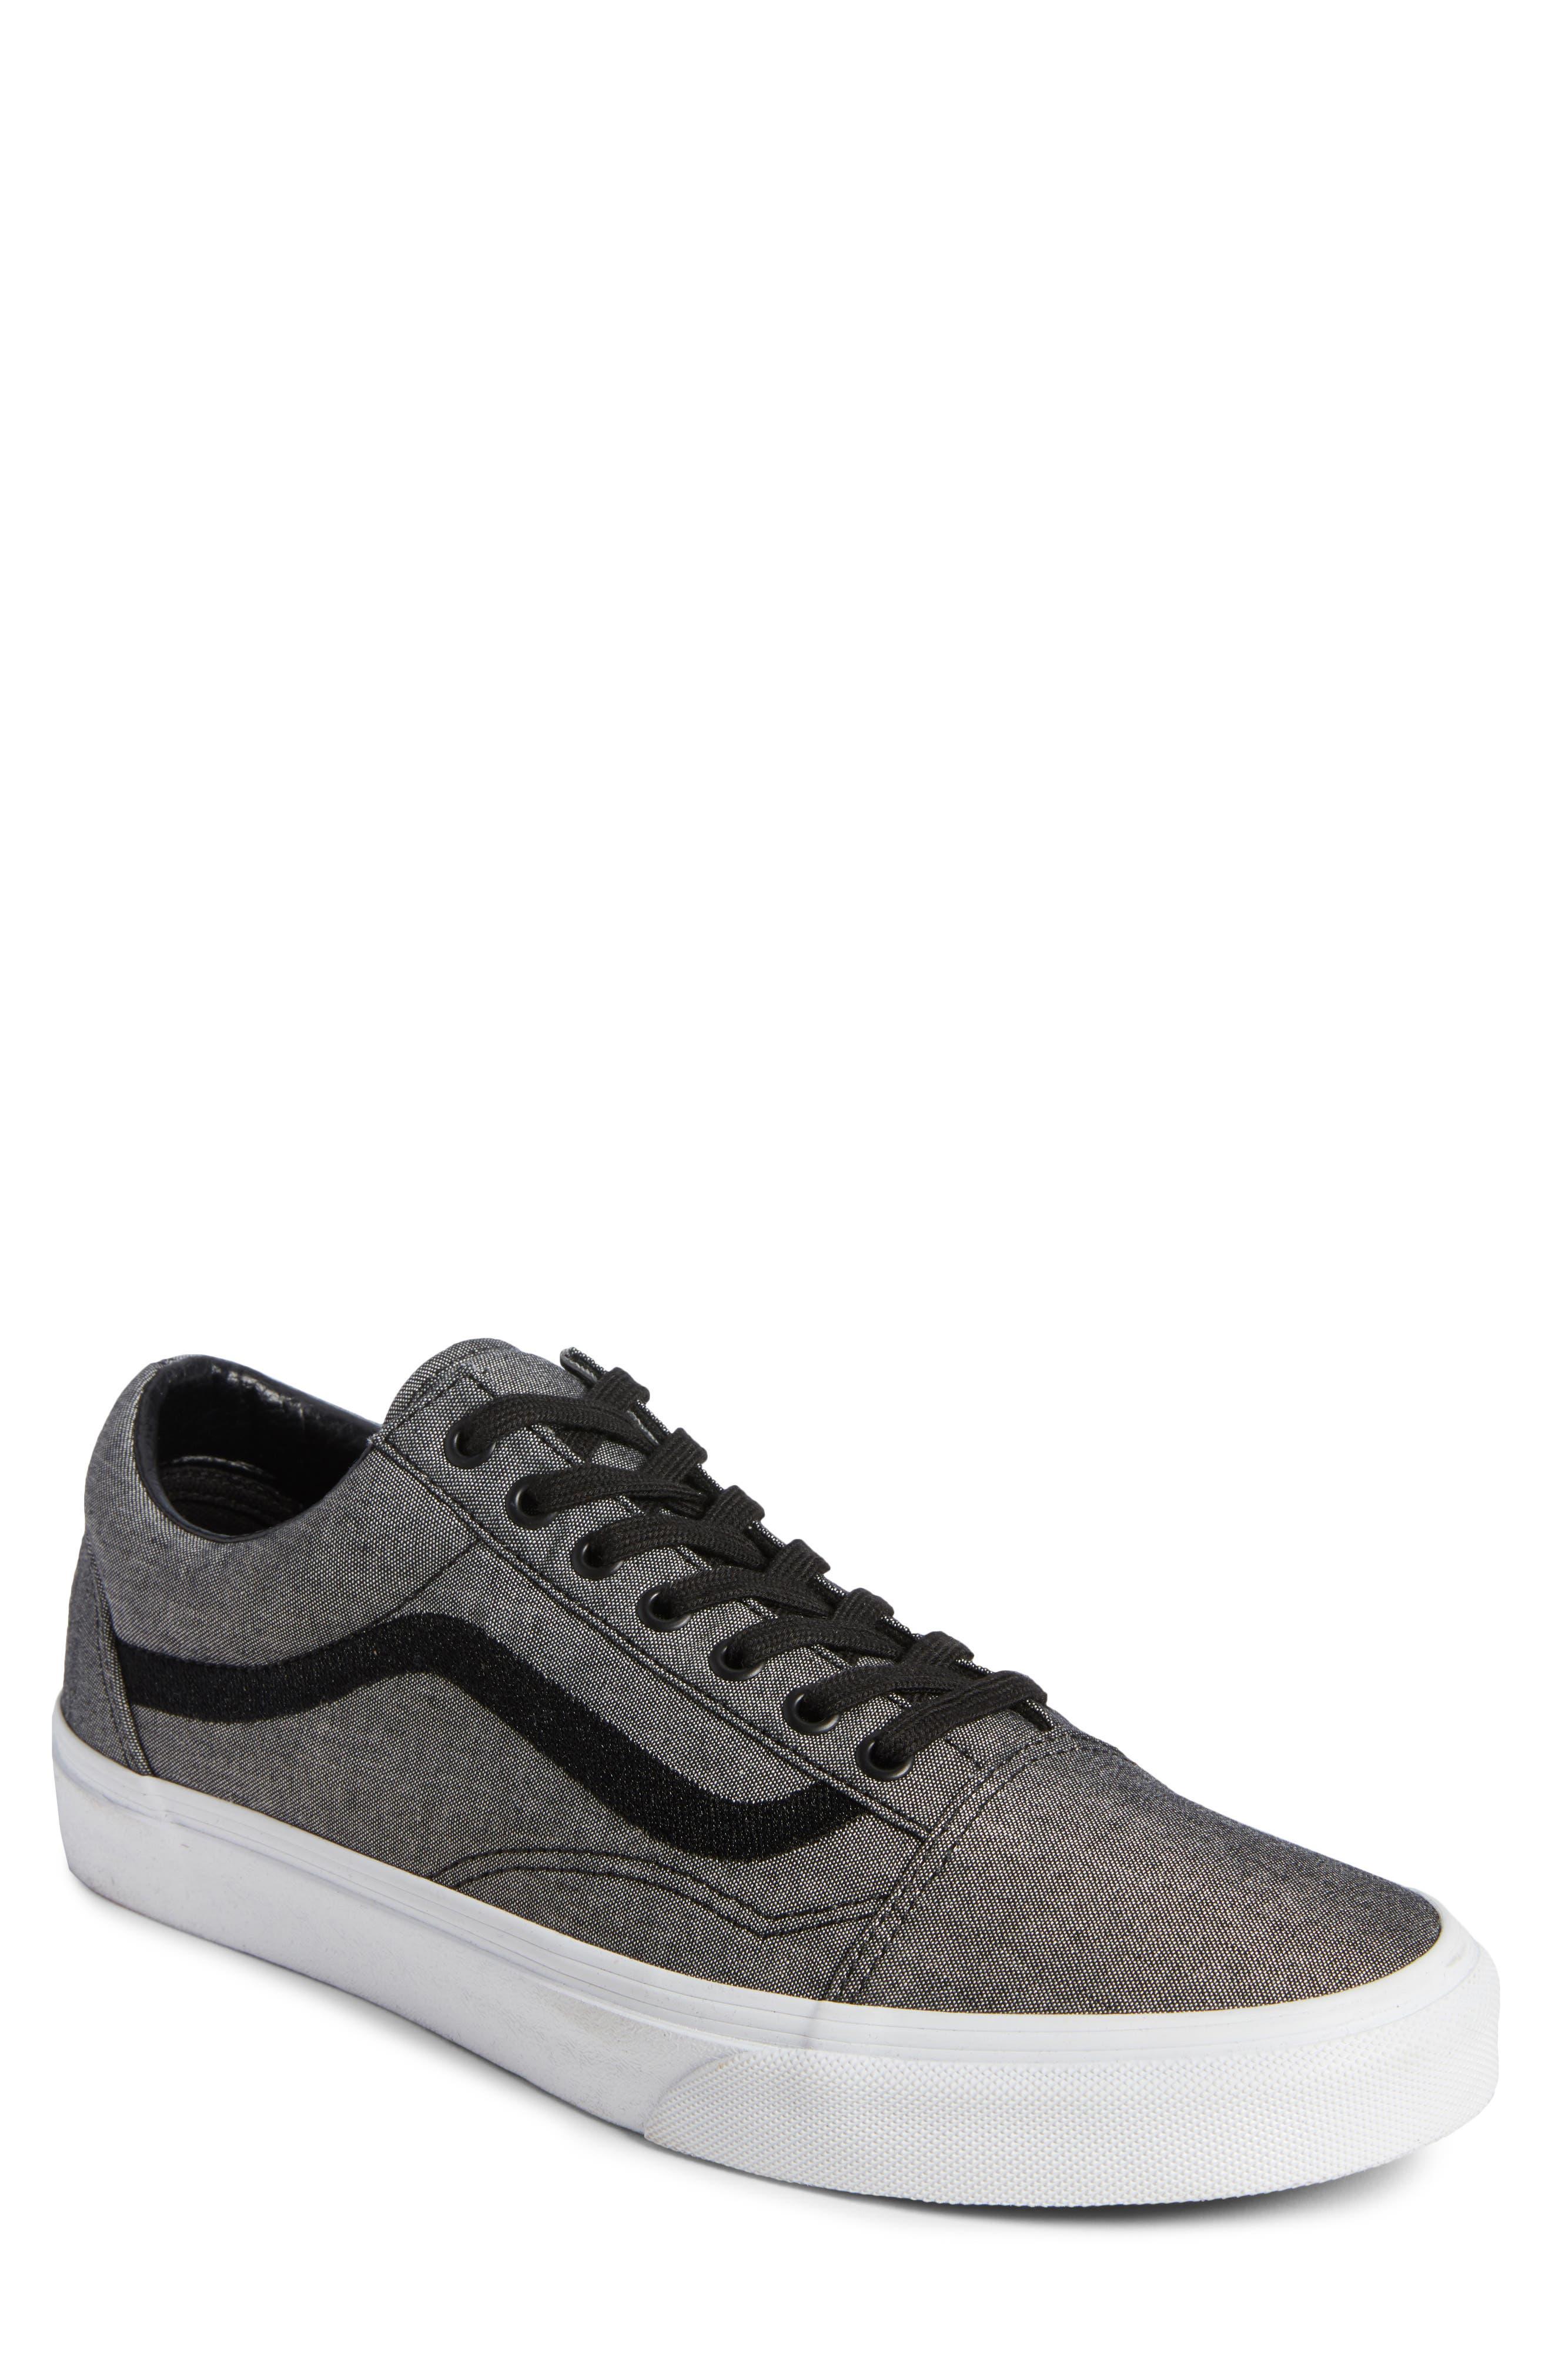 Old Skool Sneaker,                         Main,                         color, Black/ True White/ Grey